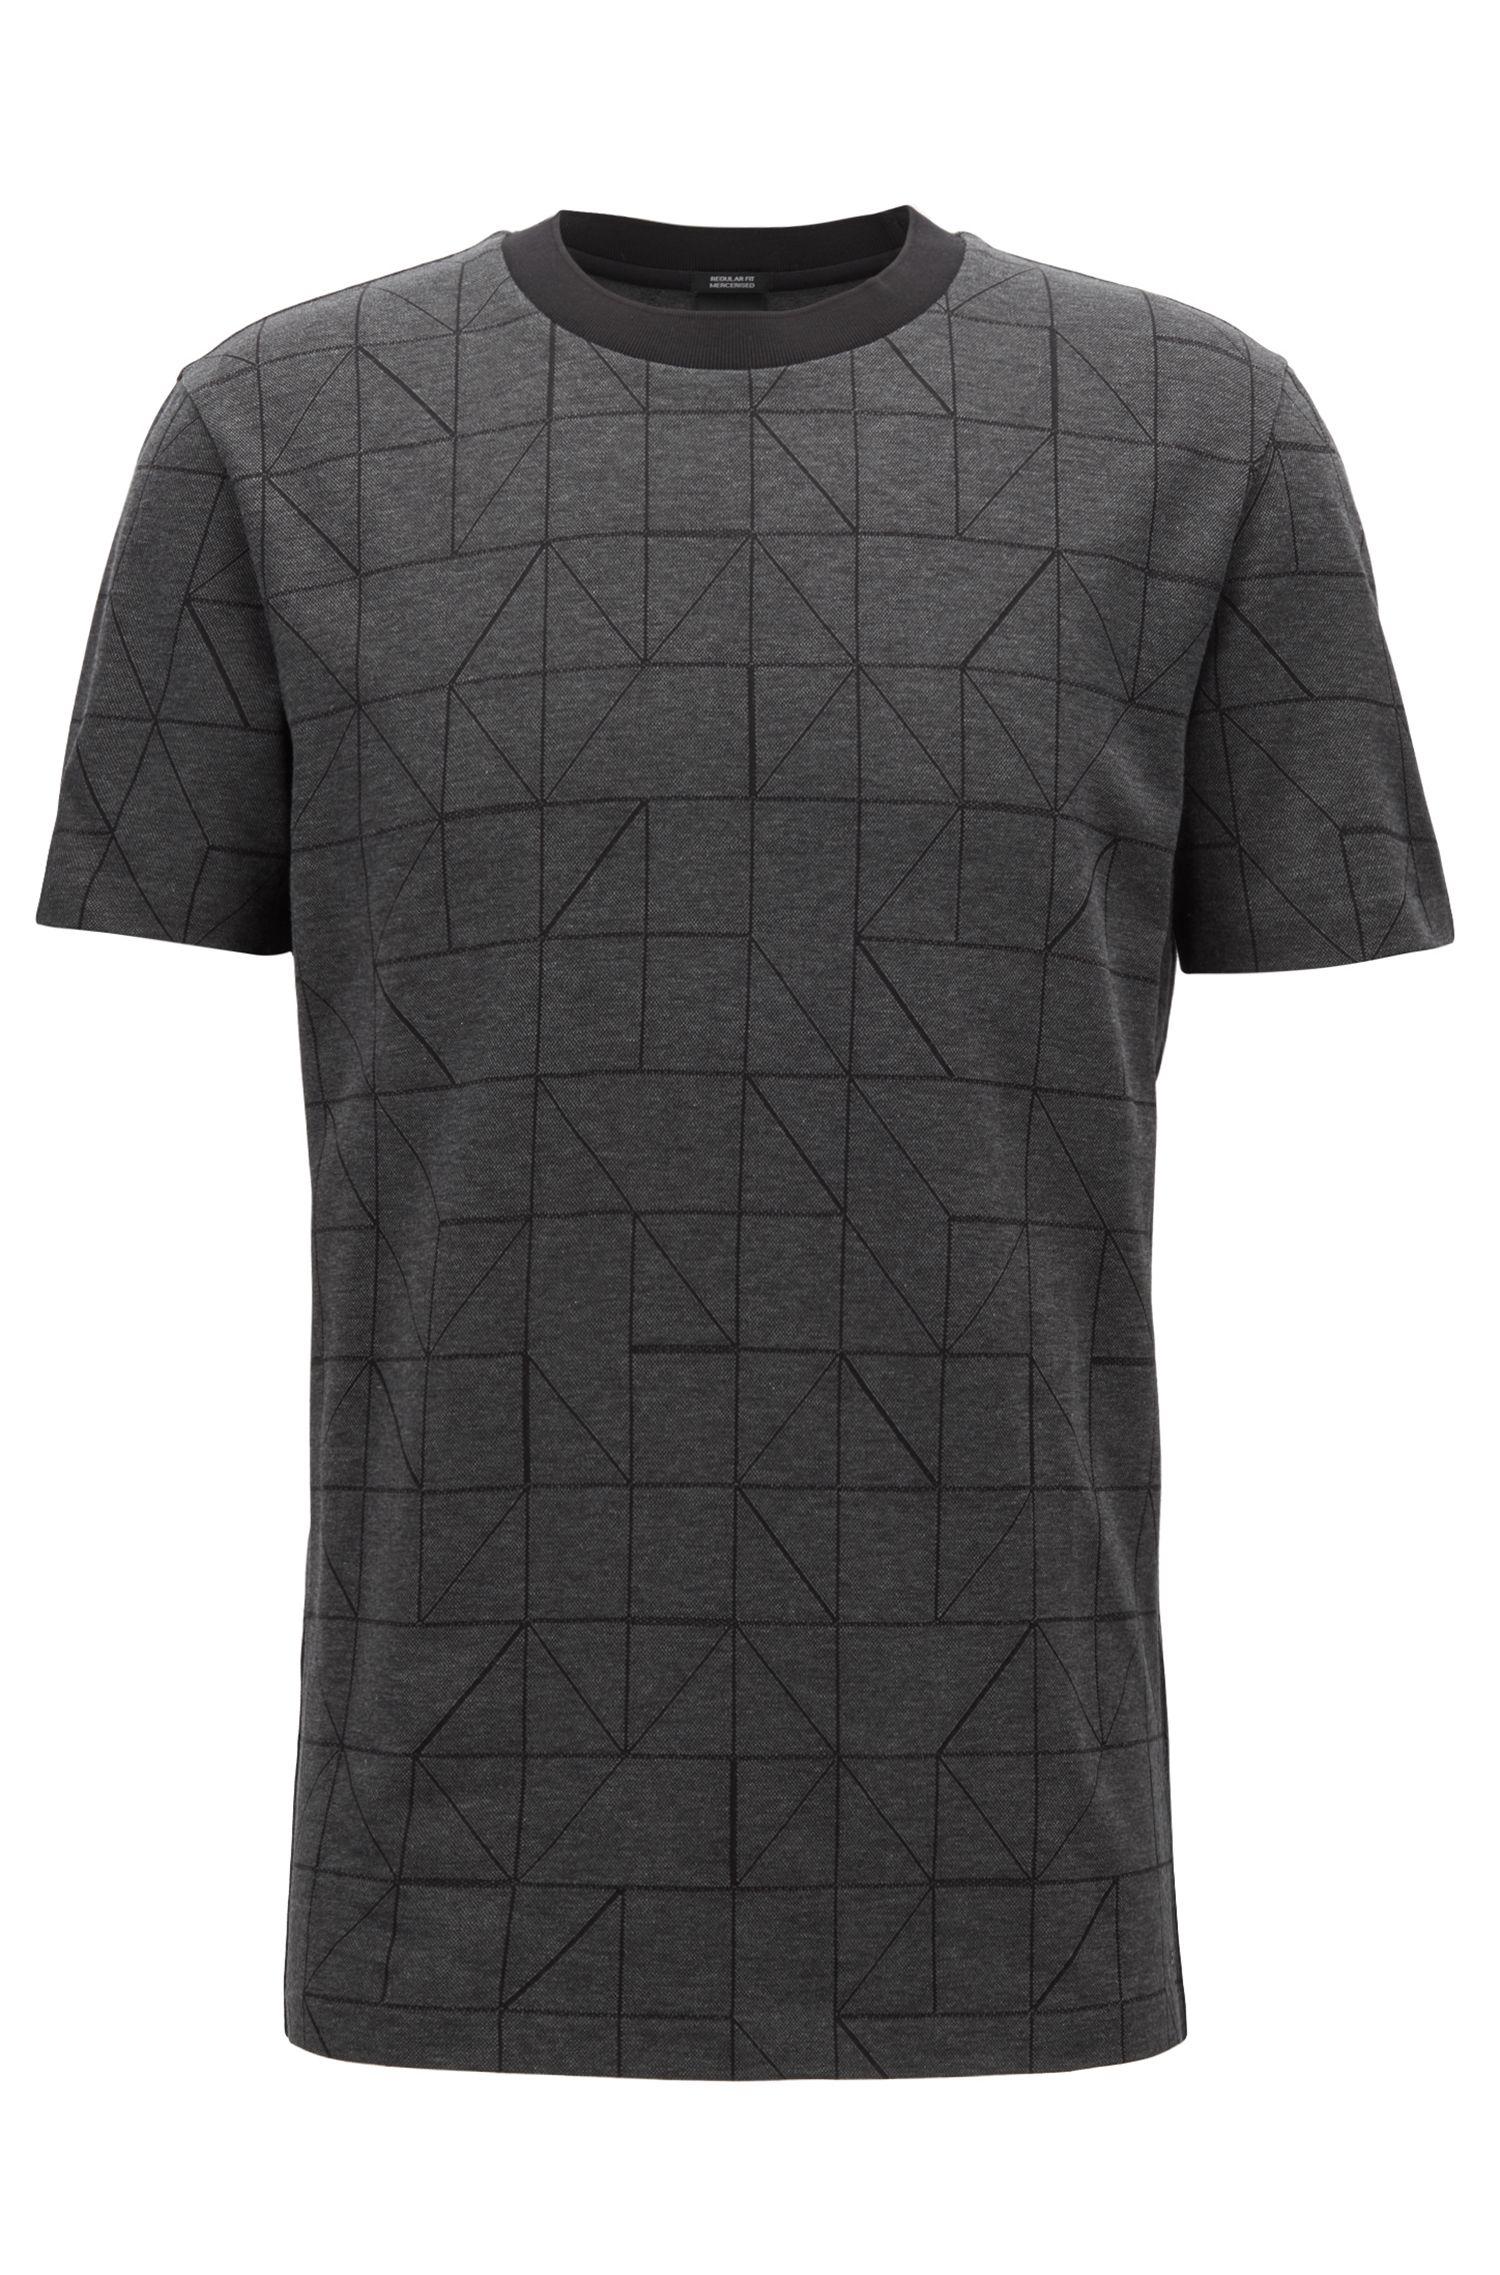 Bauhaus-inspired patterned T-shirt in mercerized cotton jacquard, Black